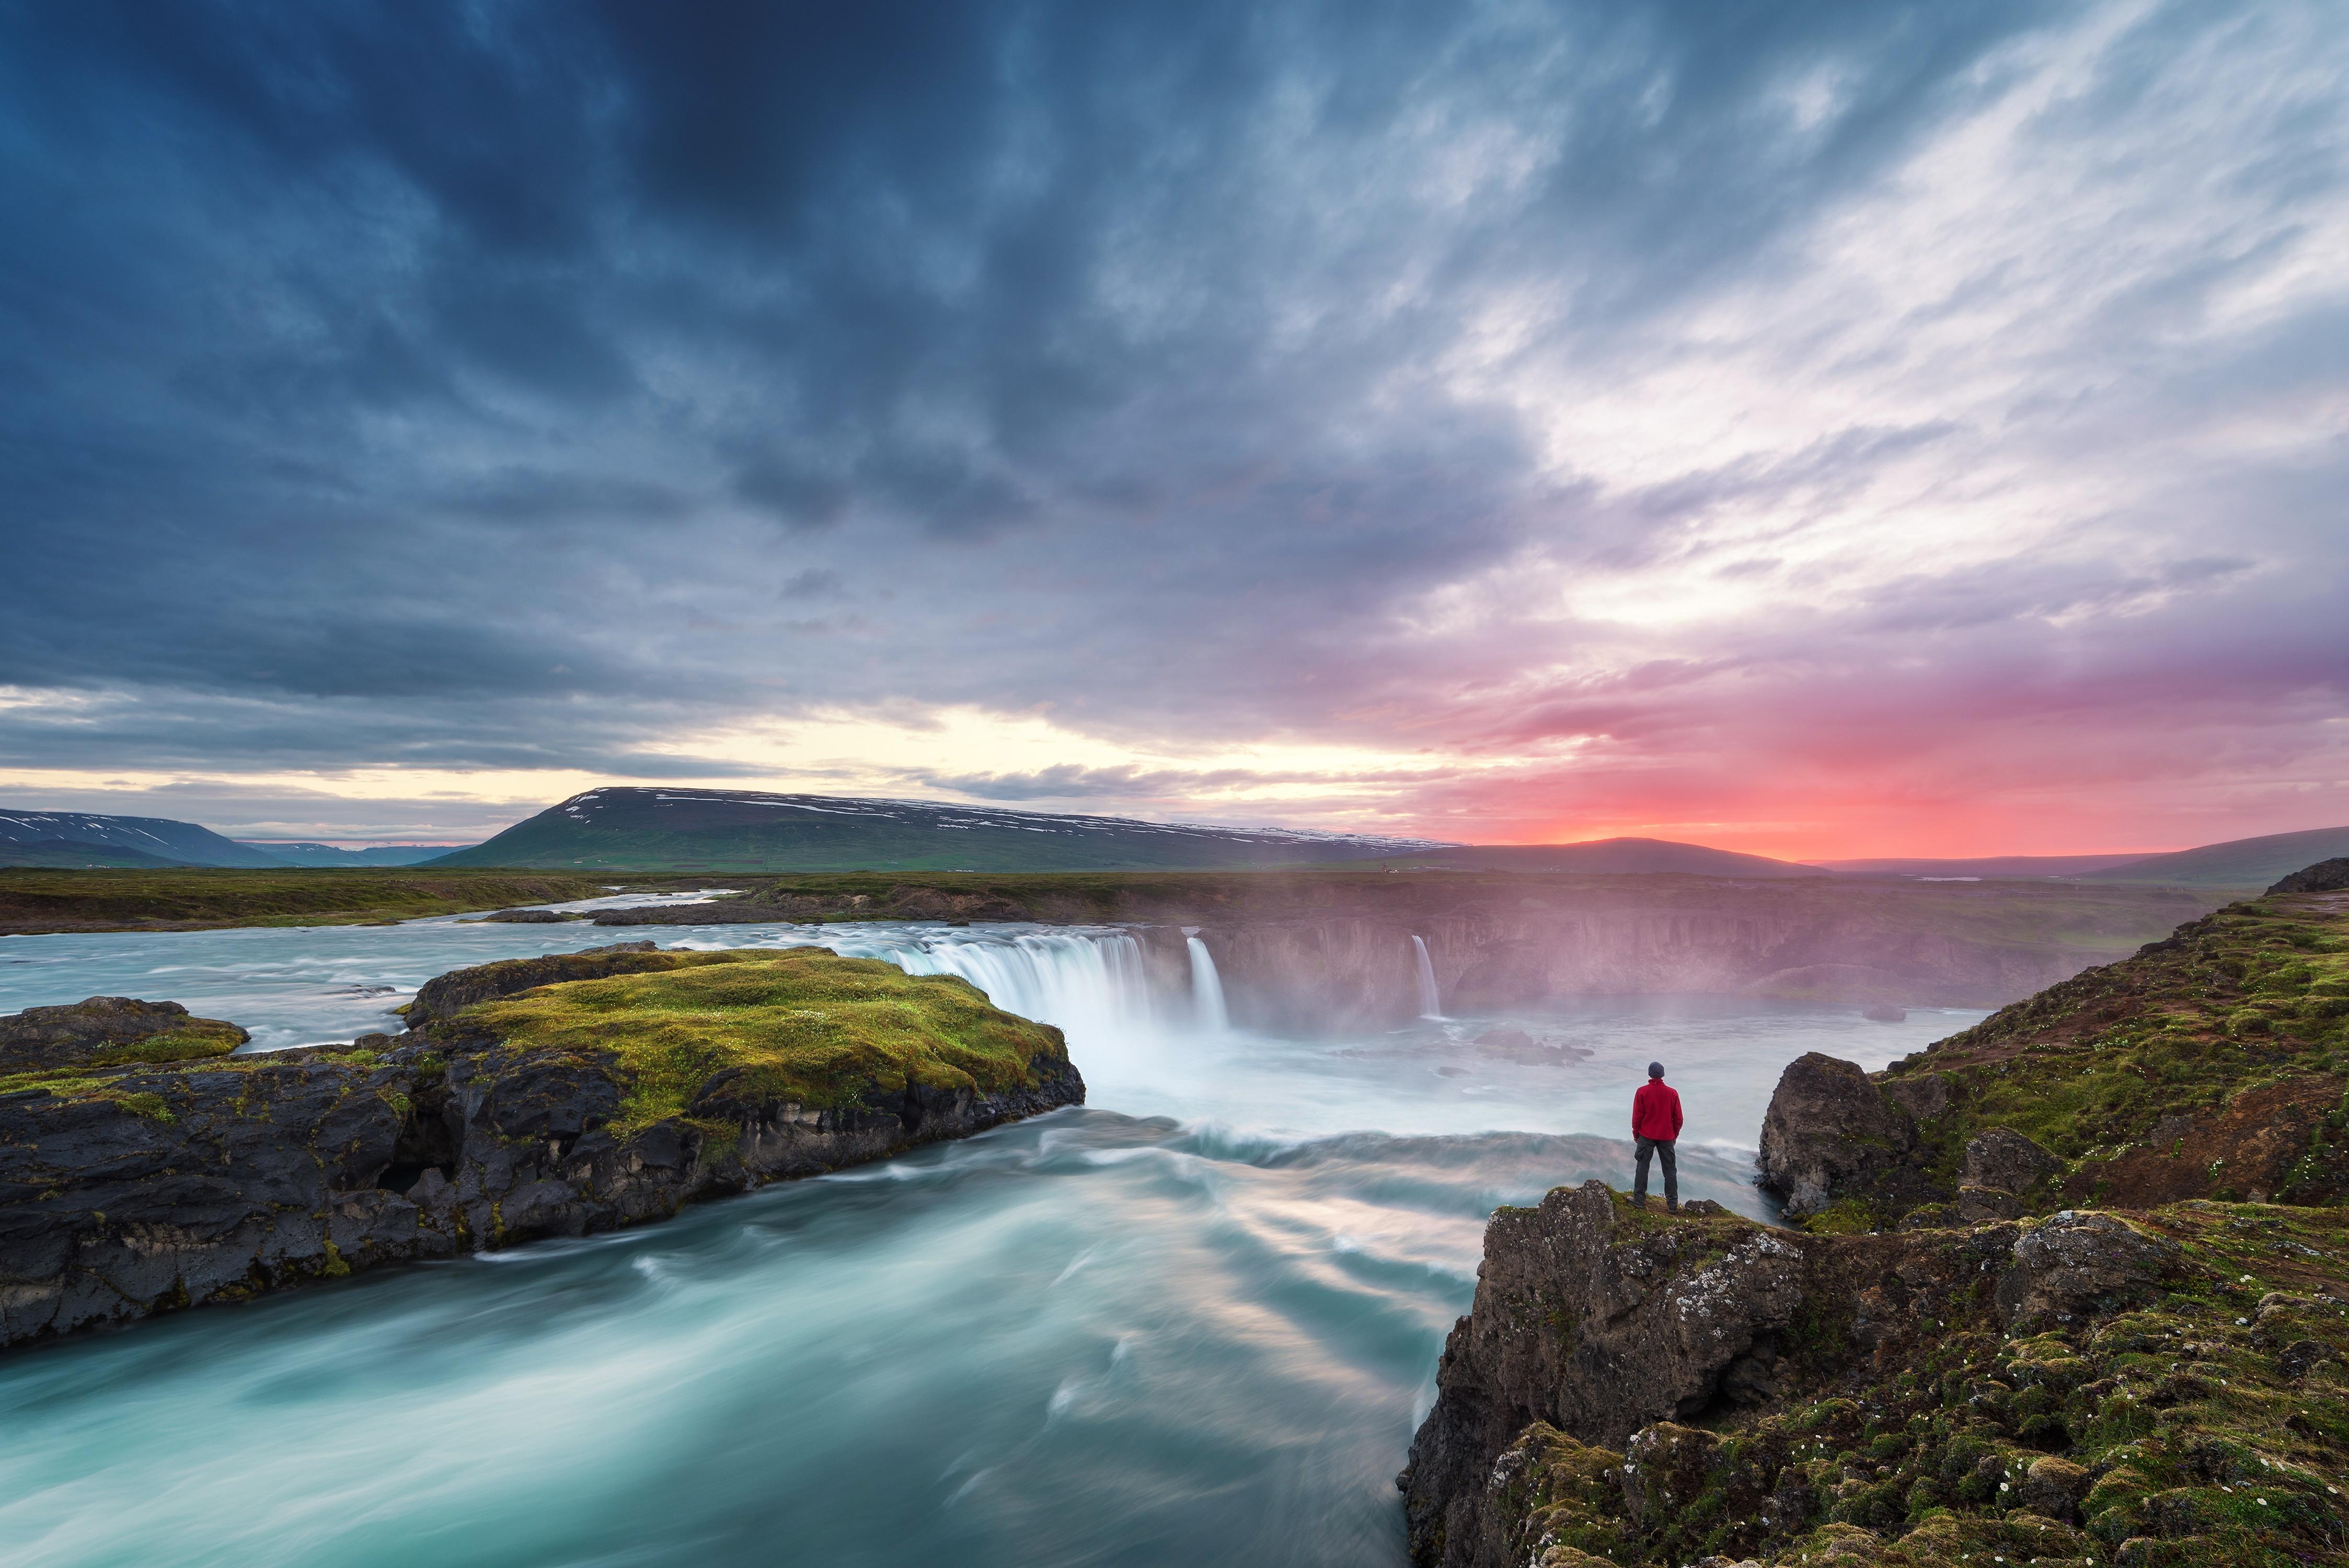 Iceland_Akureyri_Godafoss_shutterstock_567716872